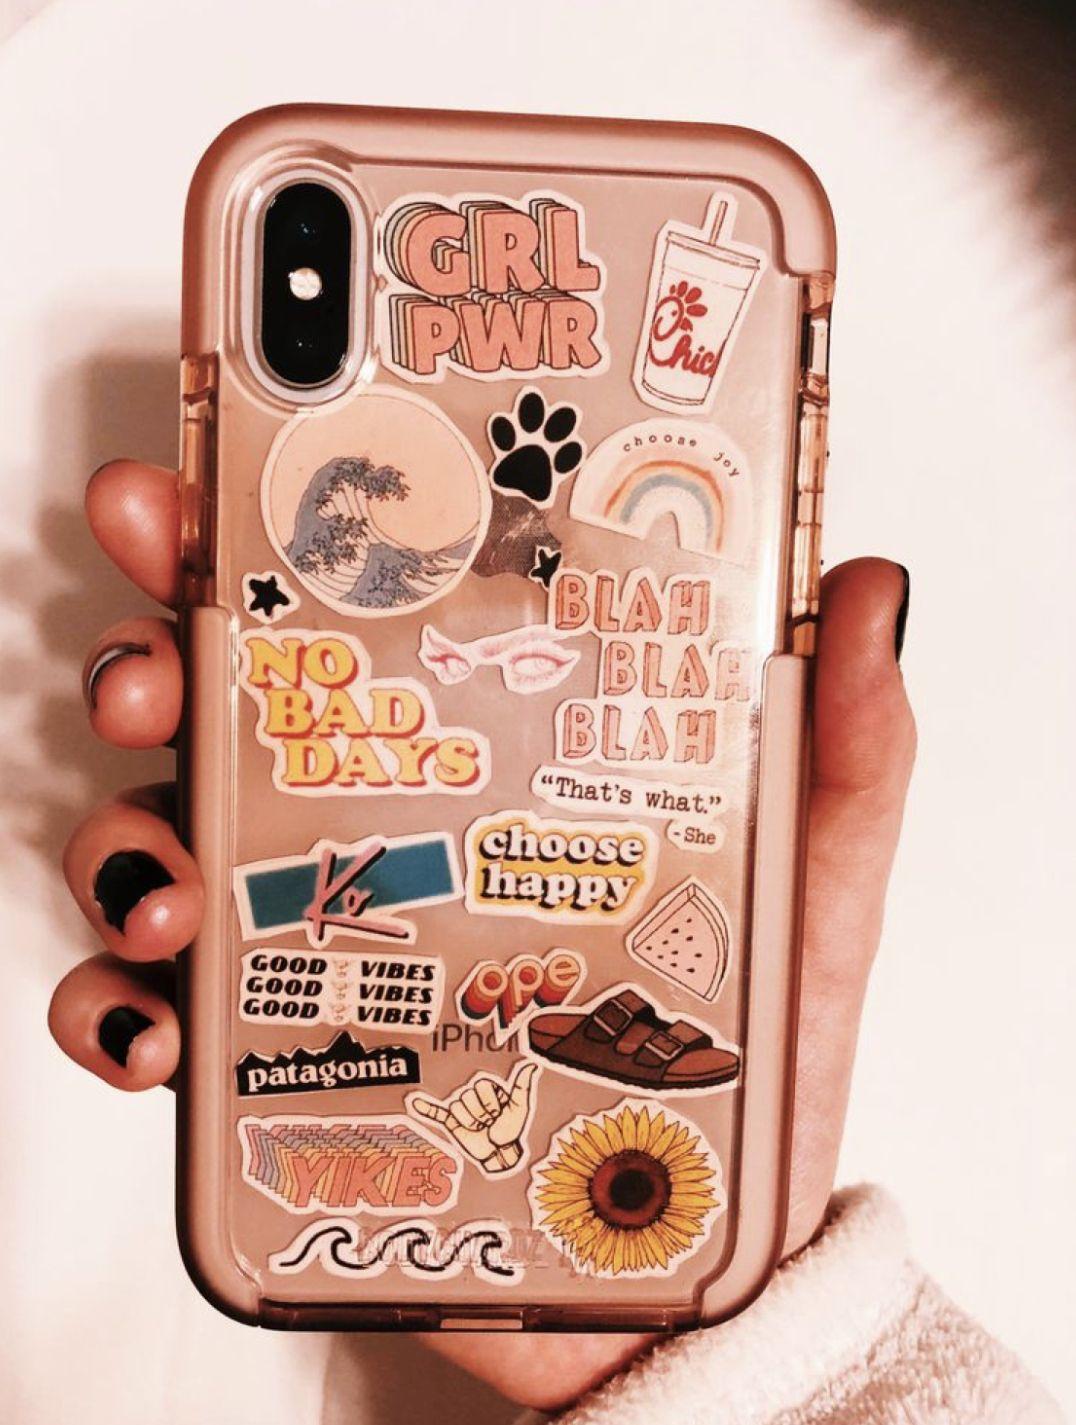 Follow me isthatbrooklynn 😍 Tumblr phone case, Diy